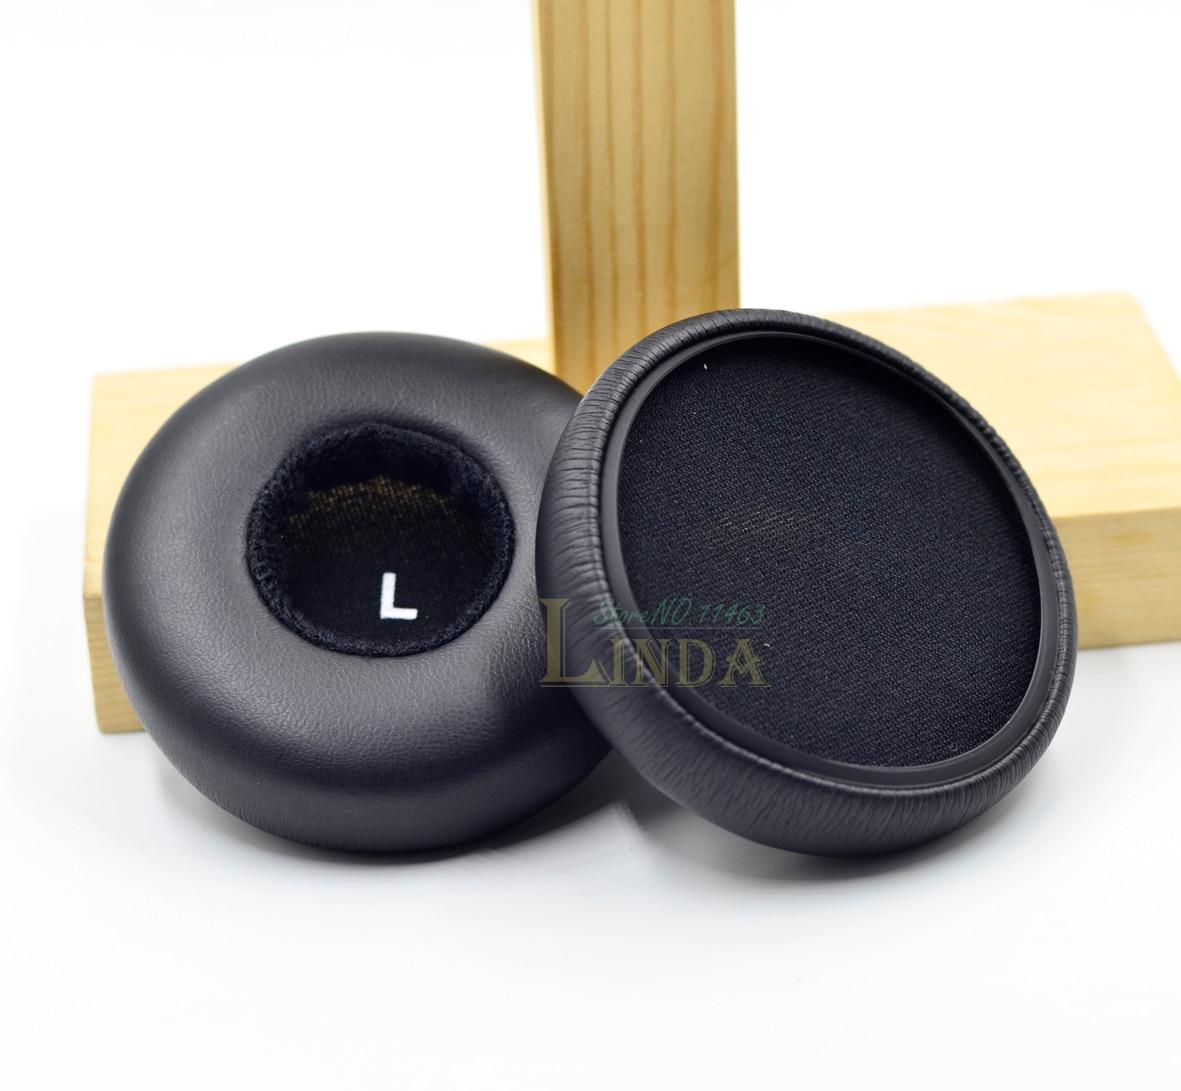 Replacement Ear Pads Cushion Foam Earpads For Akg Y50 Y55 Y50bt Y 50 Headphone Bt Headphones Part Headset Sponge In Earphone Accessories From Consumer Electronics On